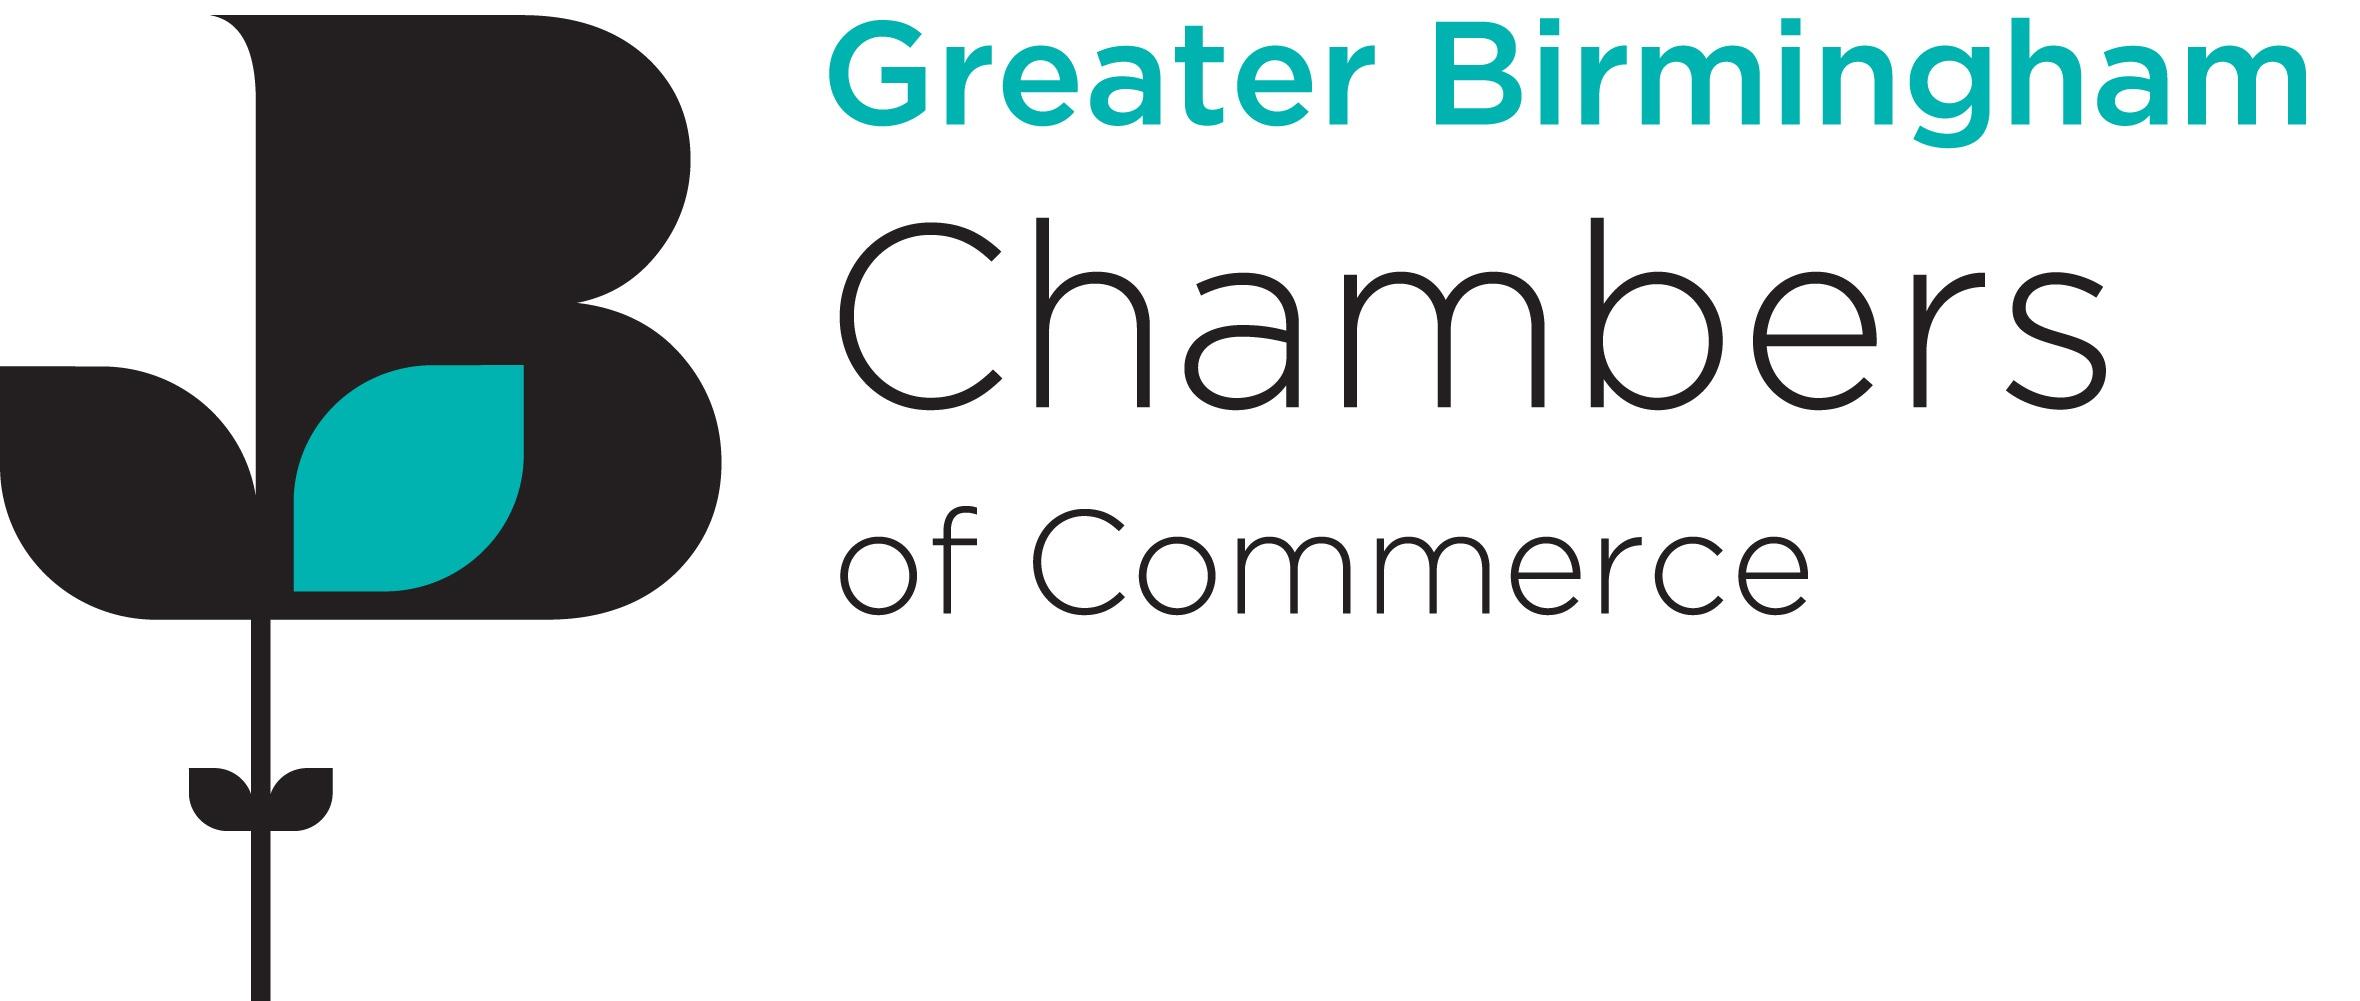 Greater-Birmingham-Chambers-of-Commerce-Oct-13.jpg